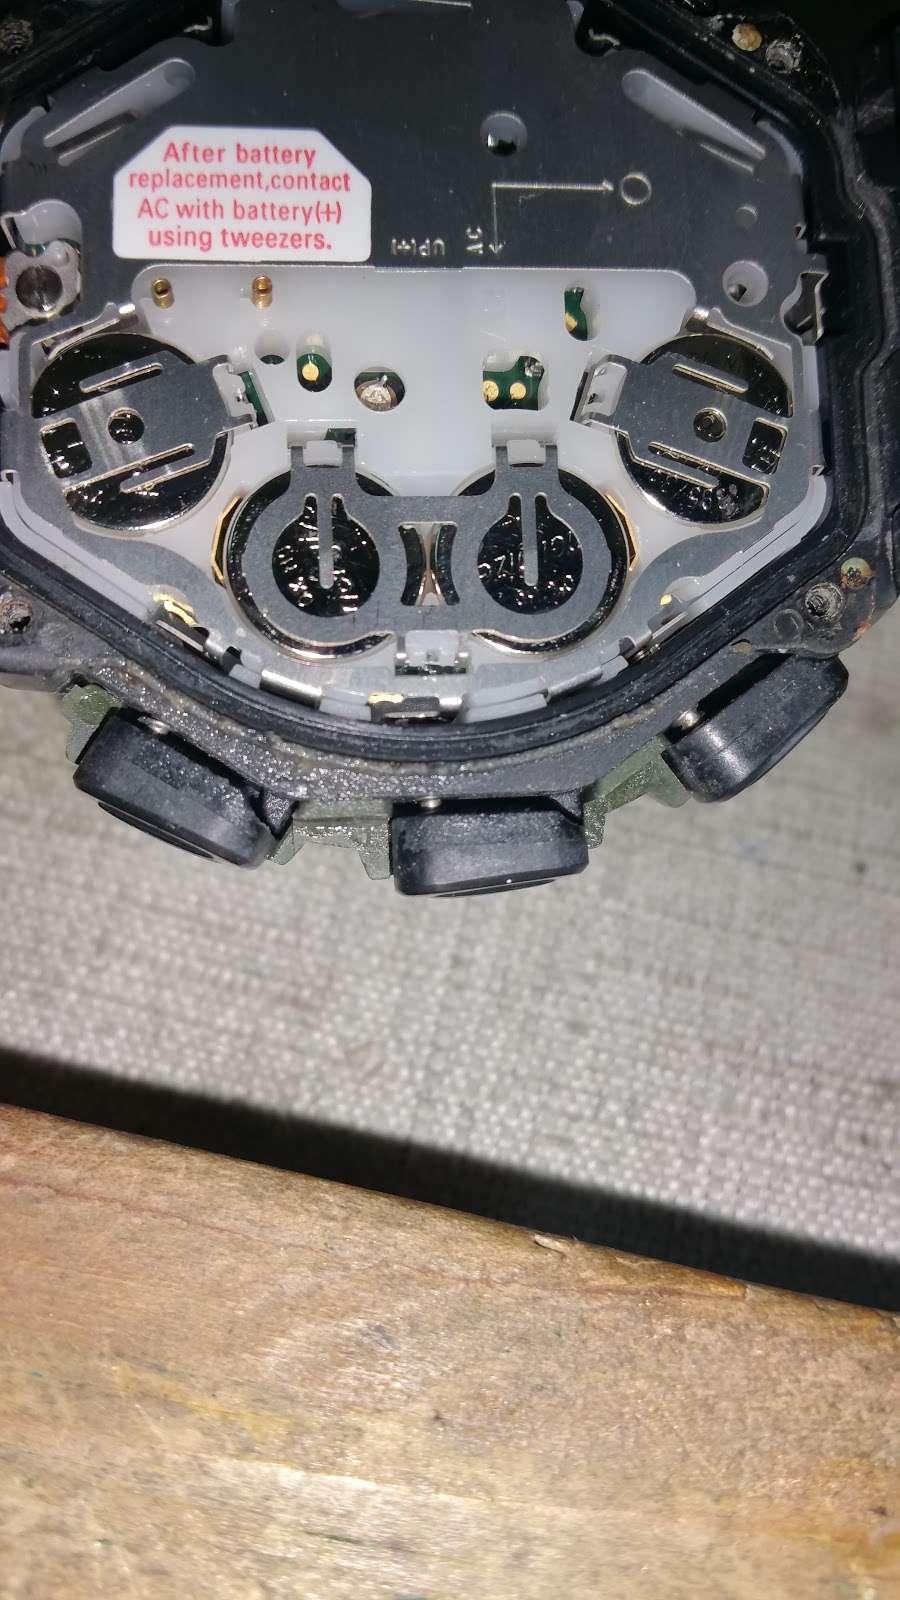 Camilo professional waches repair - shopping mall  | Photo 1 of 8 | Address: Flea Market & Mall, 7900 NW 27th Ave, Miami, FL 33147, USA | Phone: (305) 721-9244